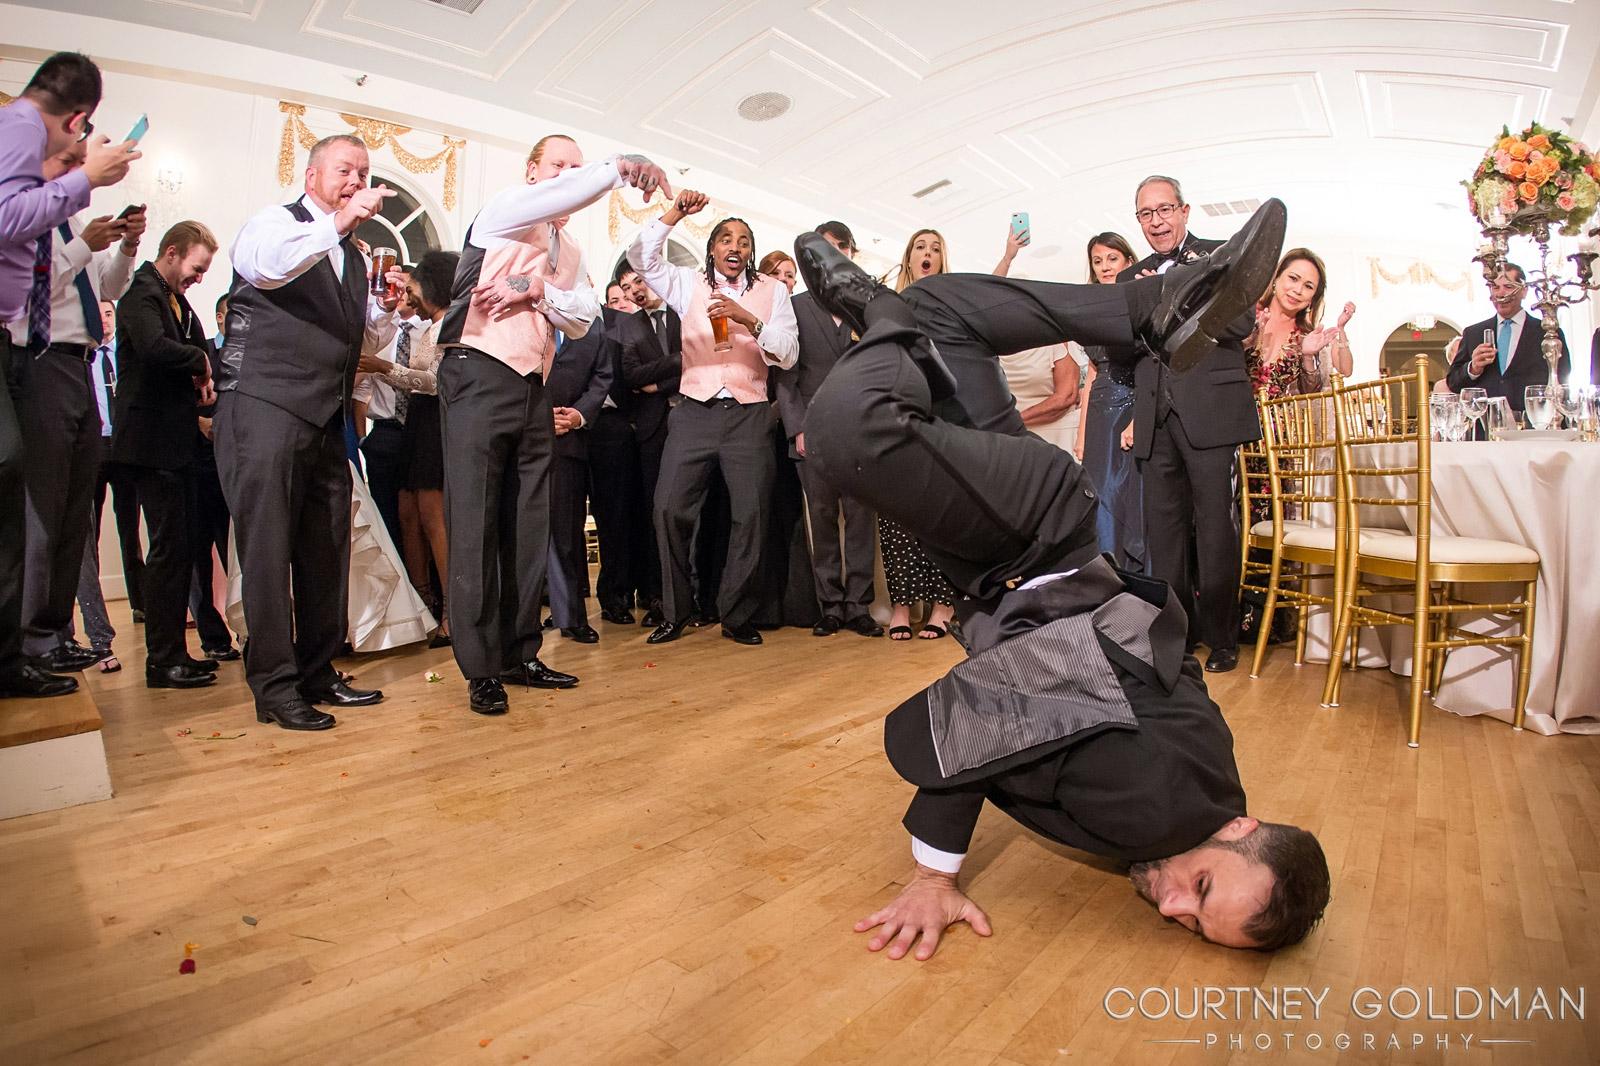 Atlanta-Wedding-Photography-by-Courtney-Goldman-55.jpg